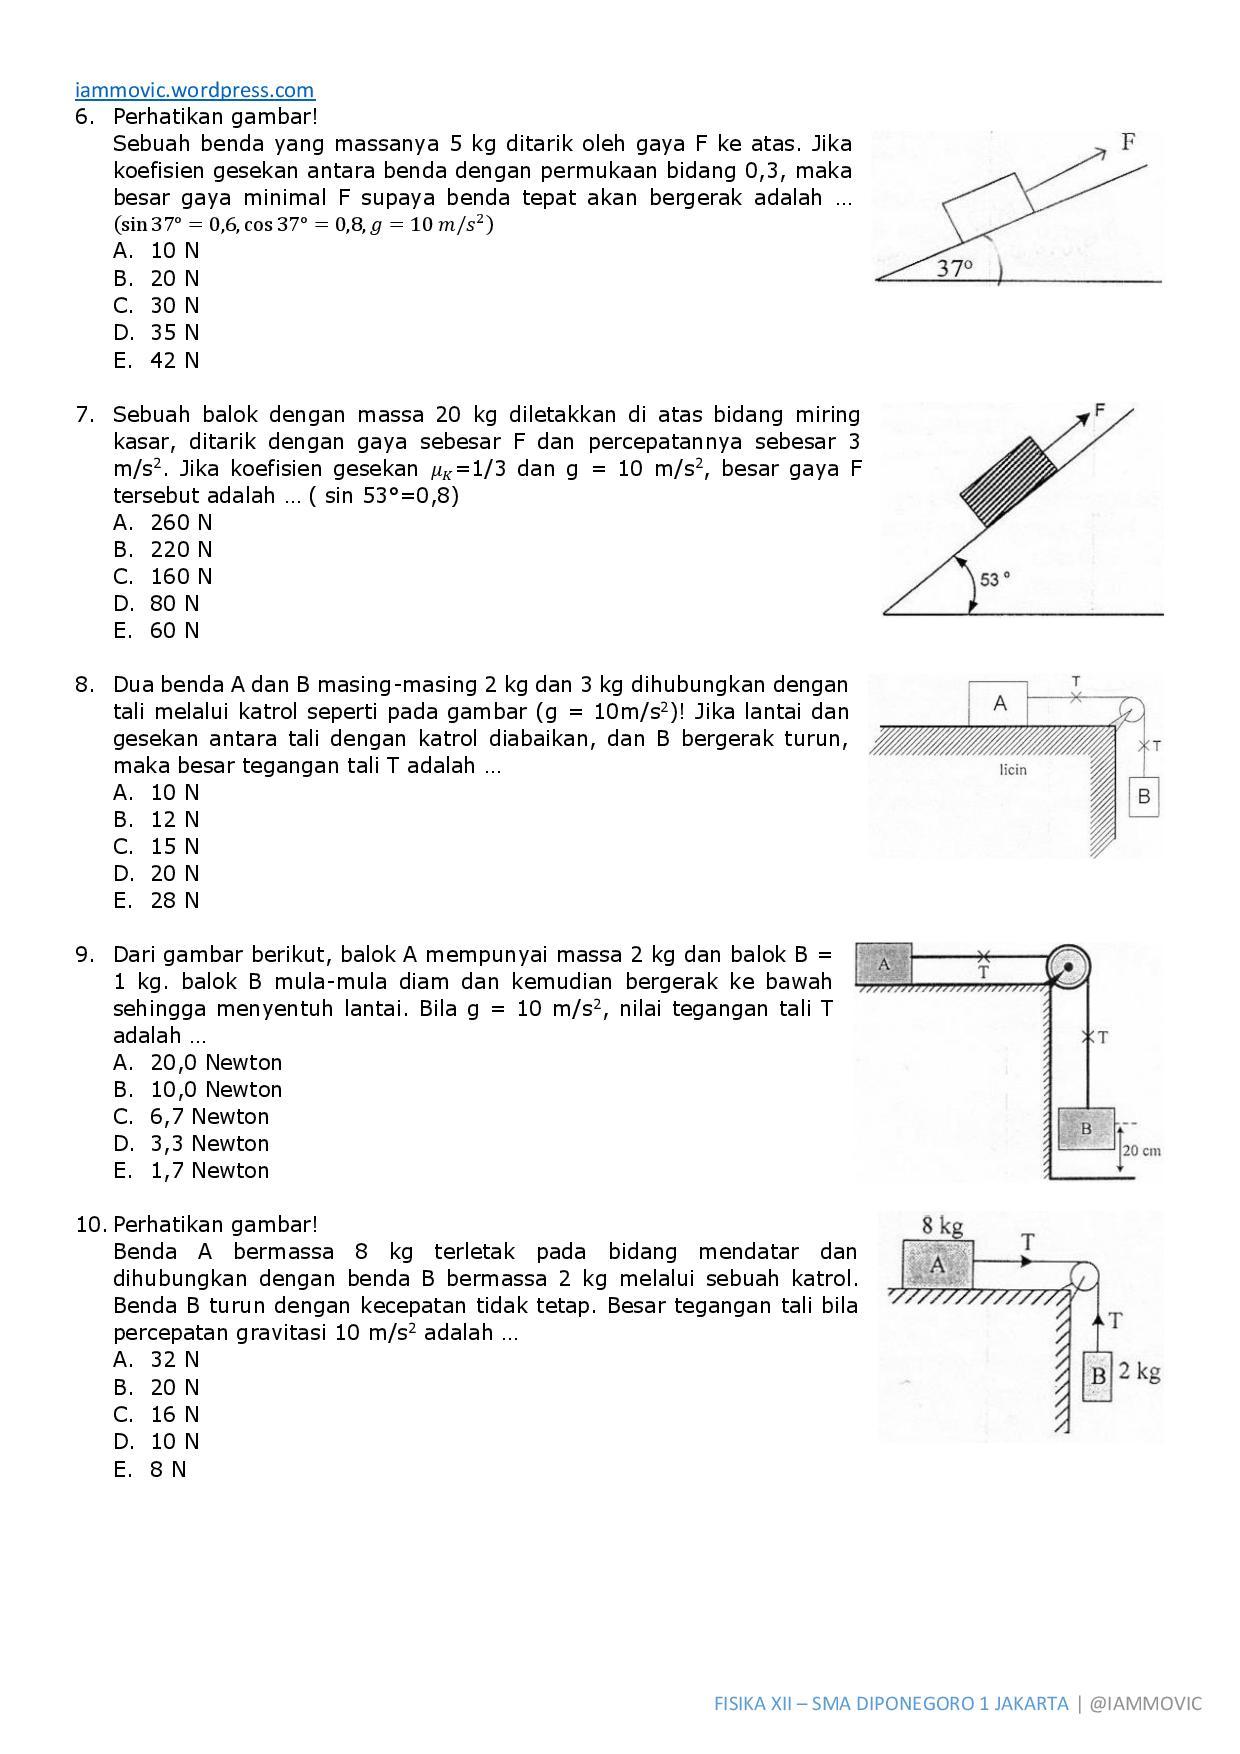 Soal Ujian Nasional Fisika Sma 2013 Dinamika Translasi Iammovic